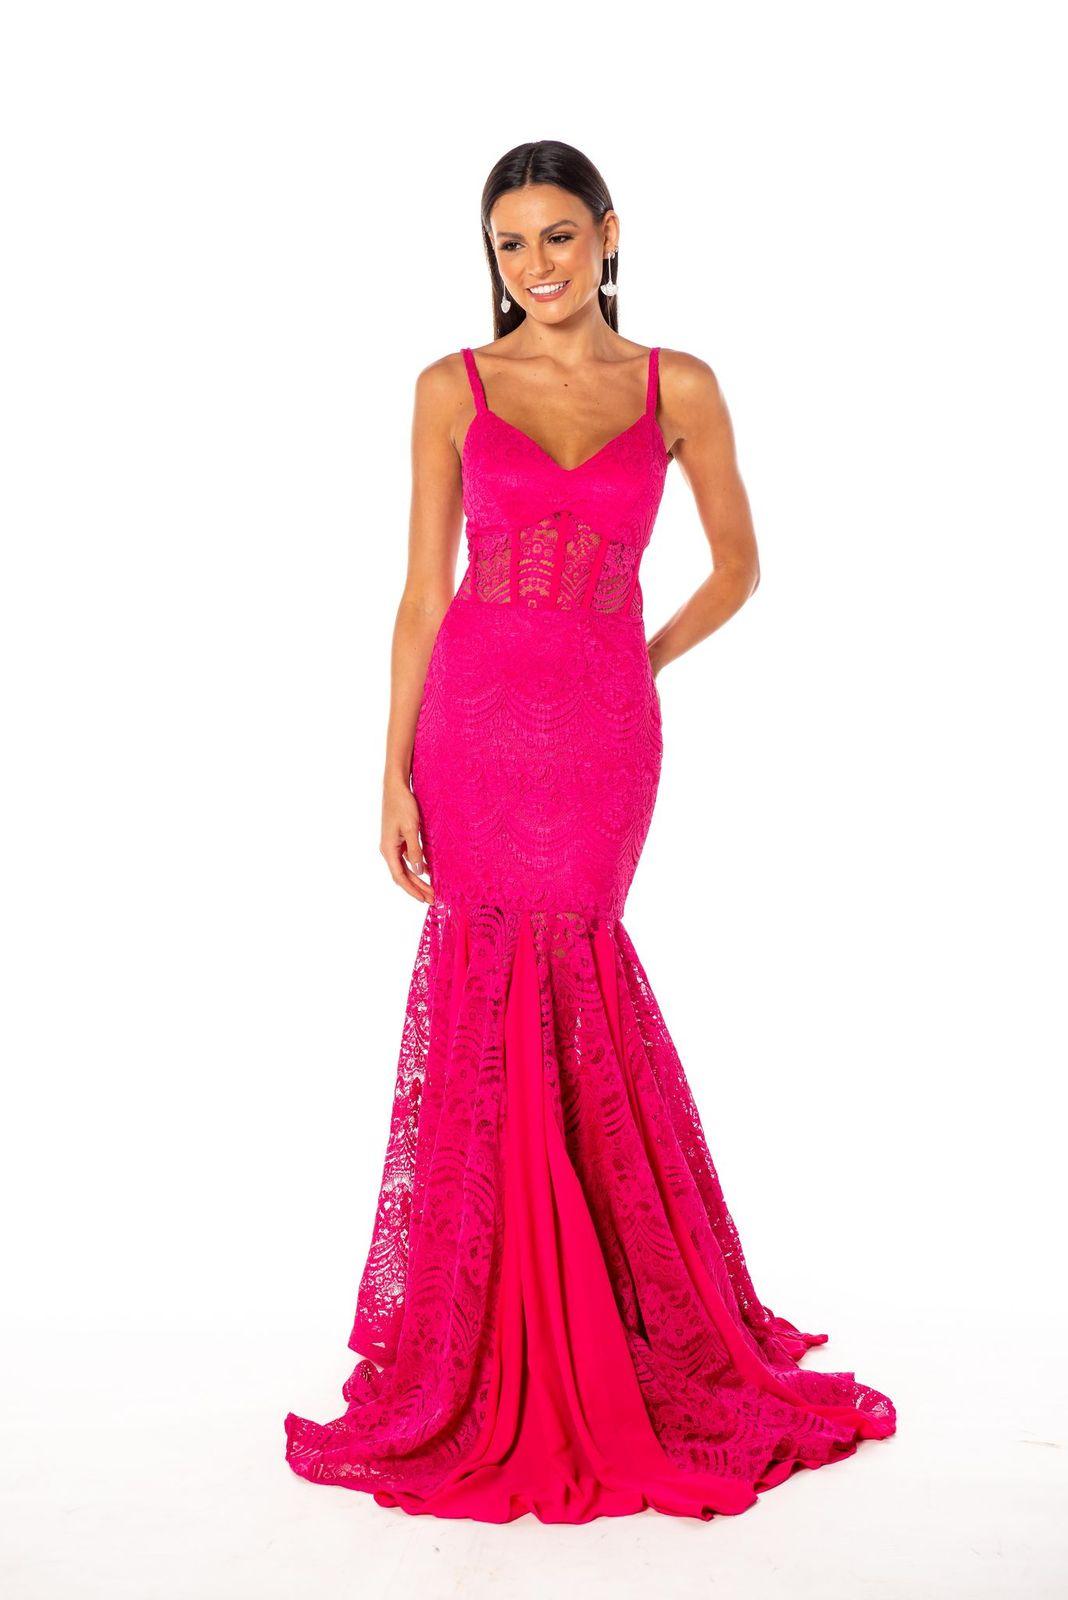 Vestido Balneário Renda Pink